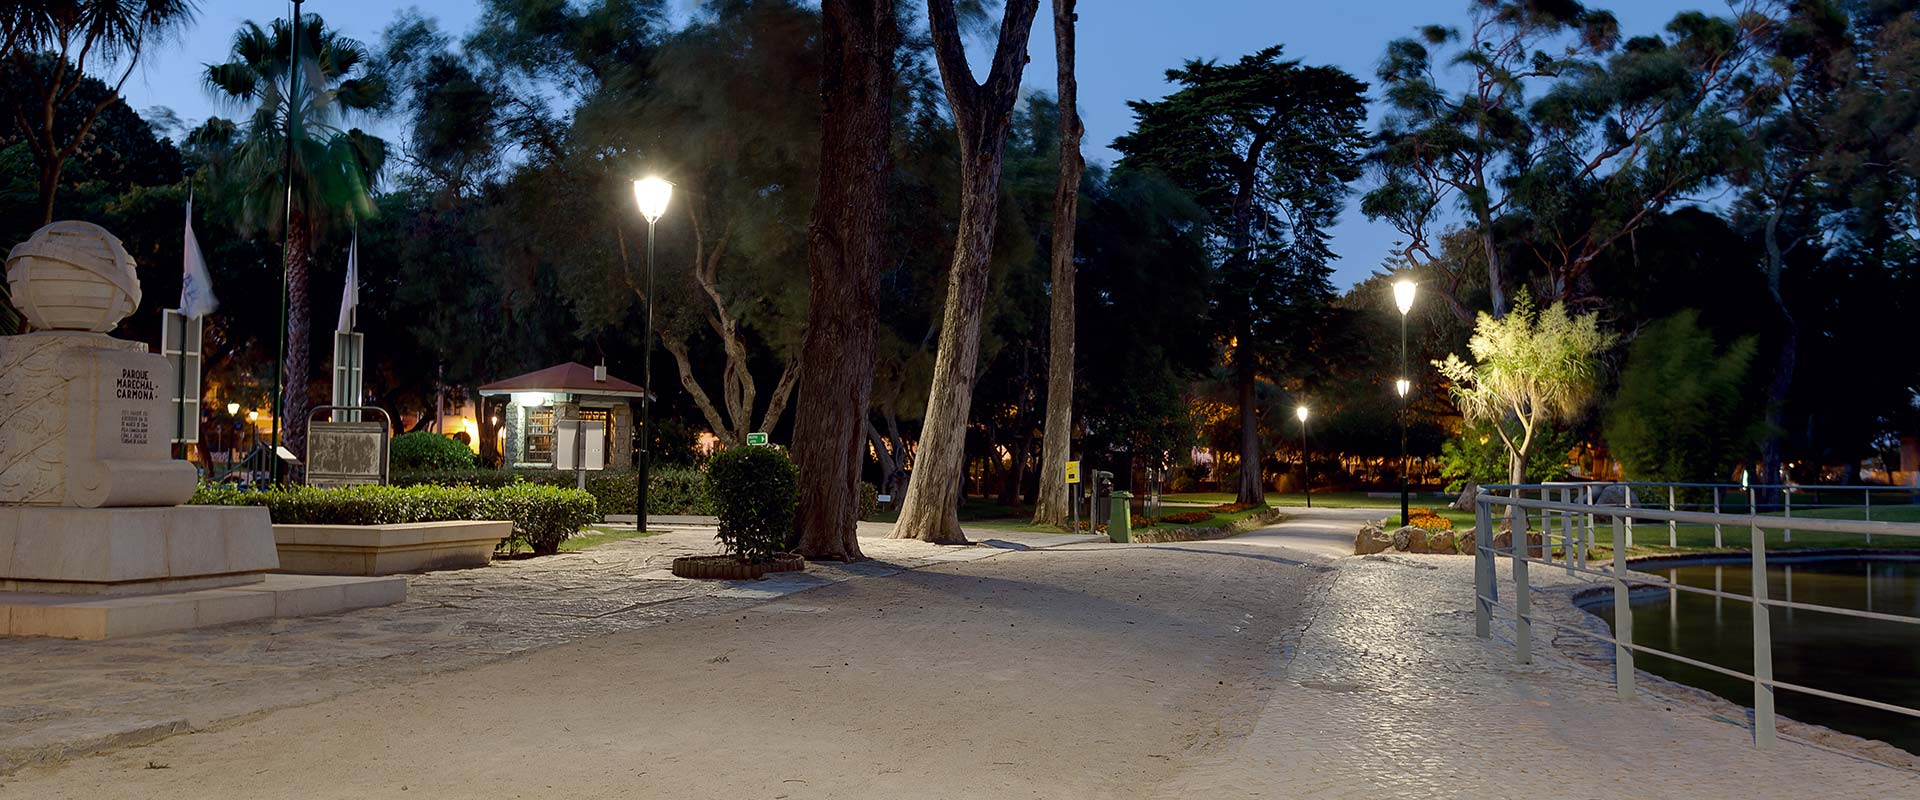 iluminacao-LED-parque-marechal-carmona